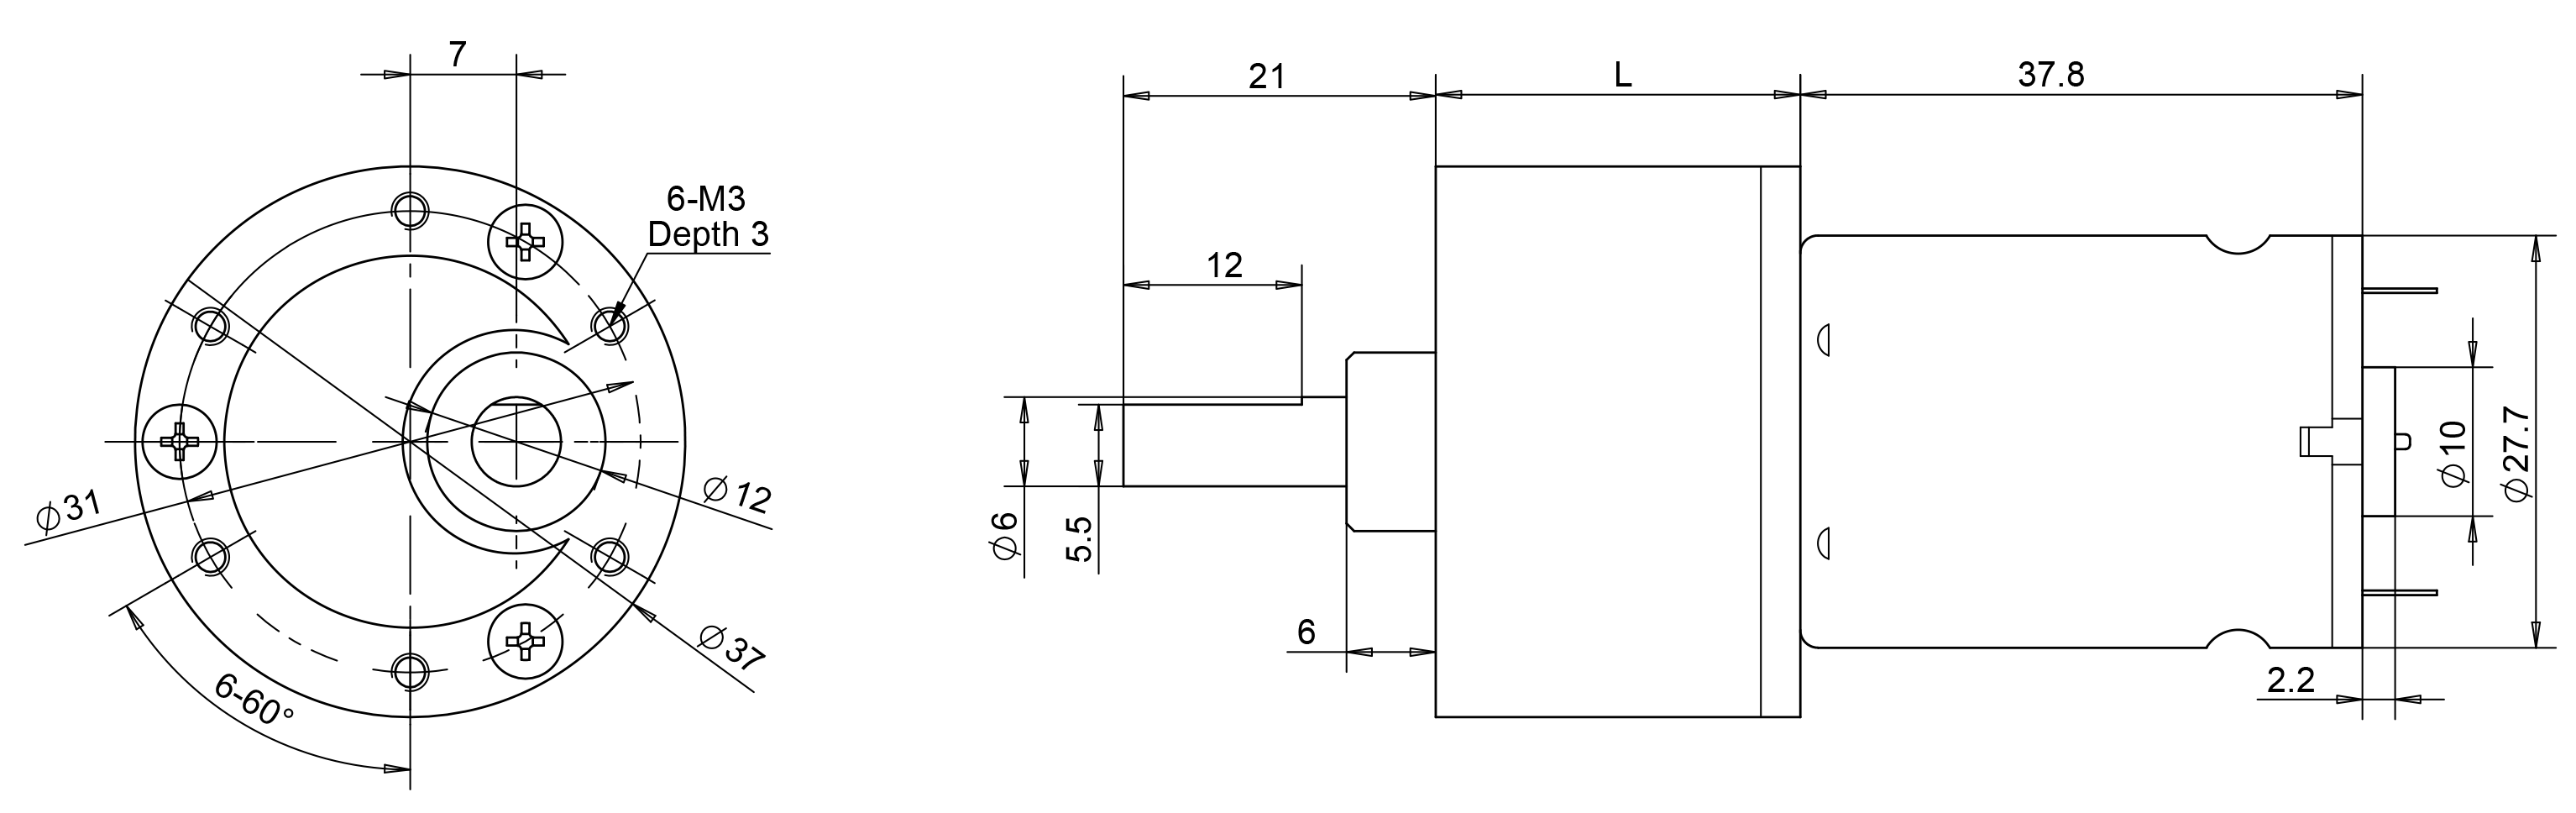 drawing of motor